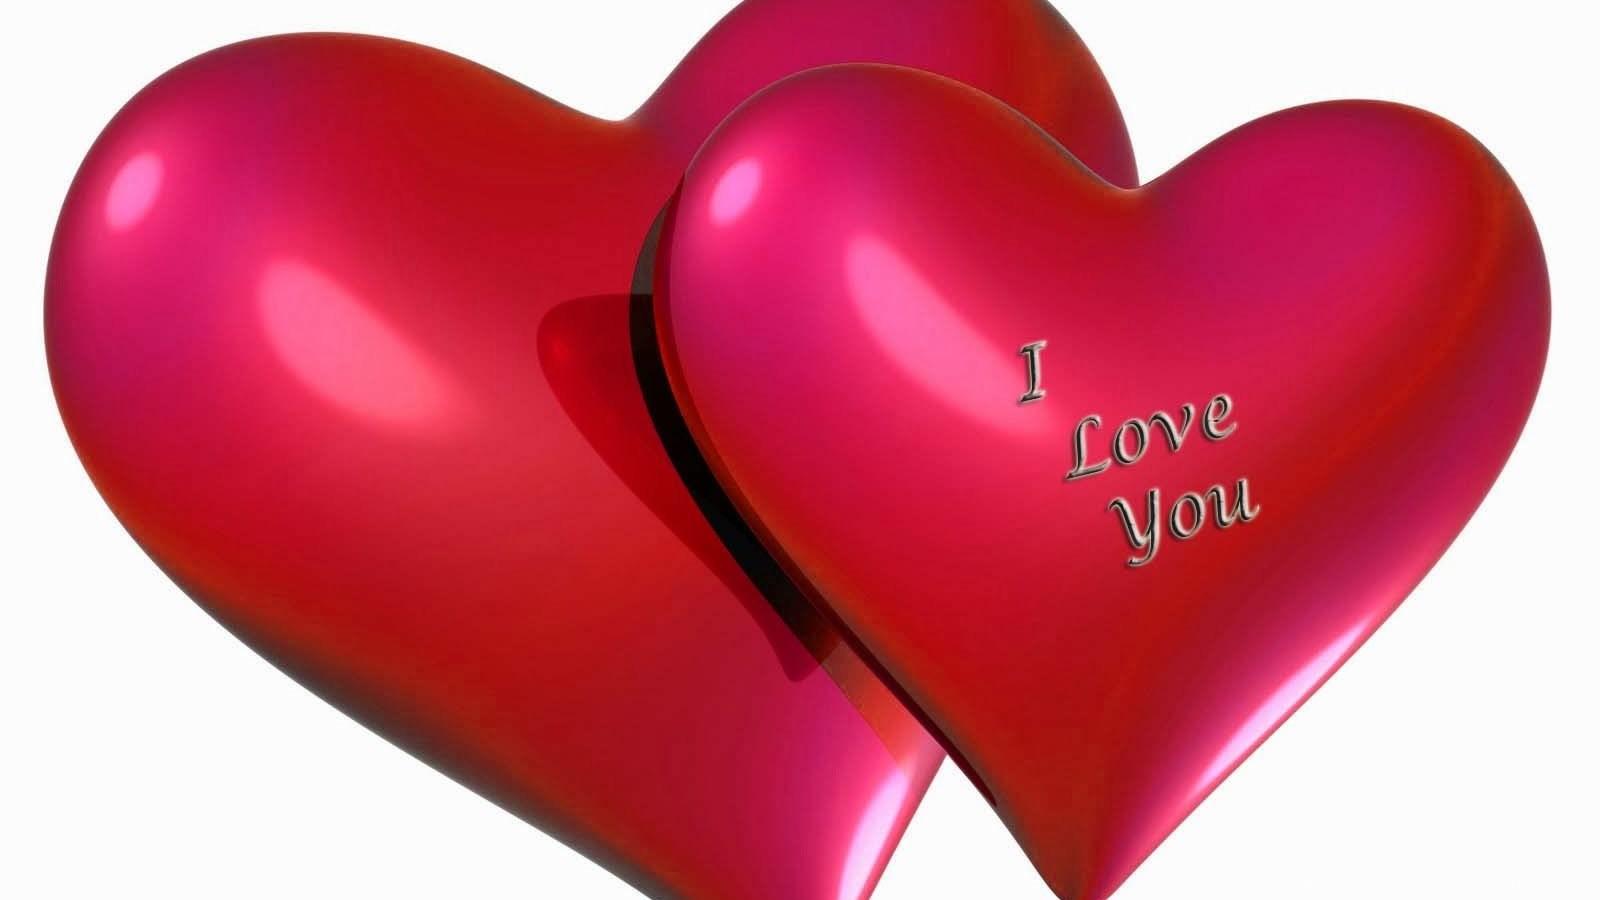 Cute Love Wallpaper Iphone 4s Cute Love Hd Wallpapers Desktop 3d Desktop Background